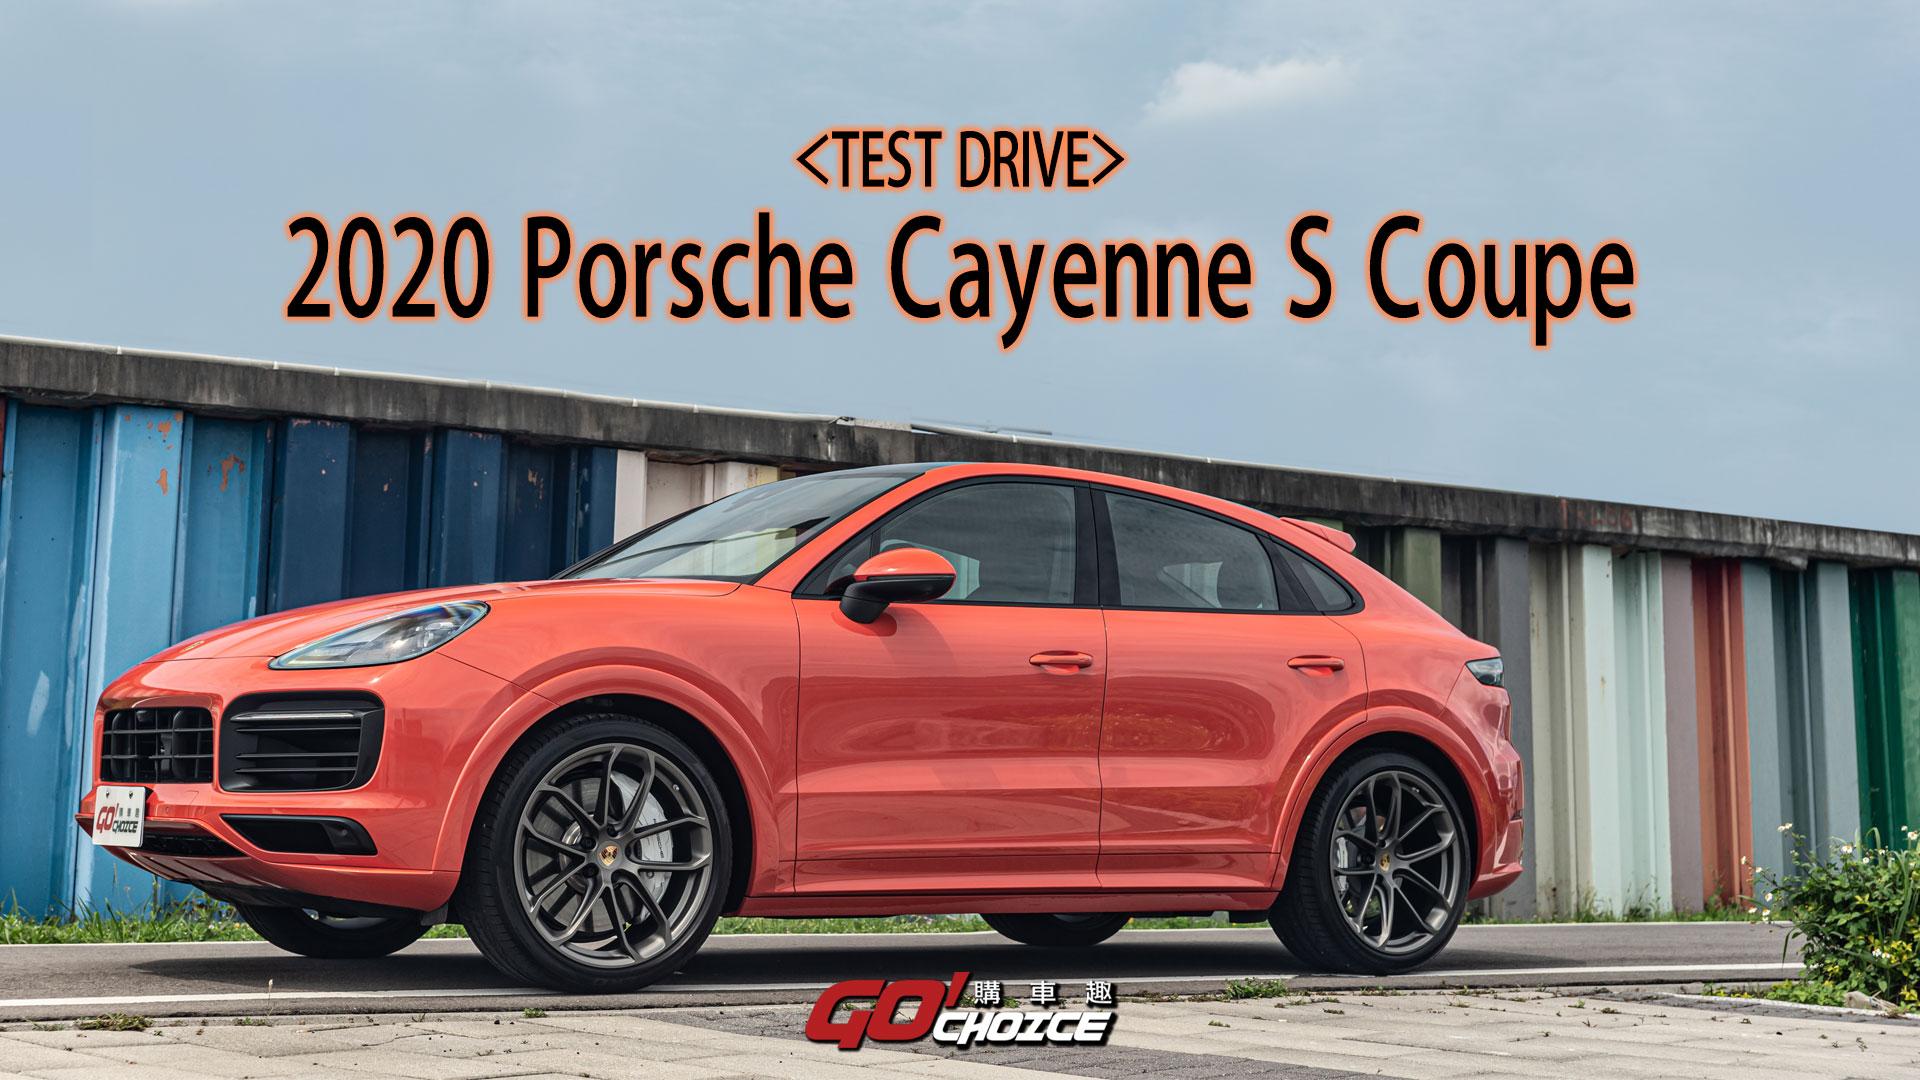 試駕報導-2020 Porsche Cayenne S Coupe